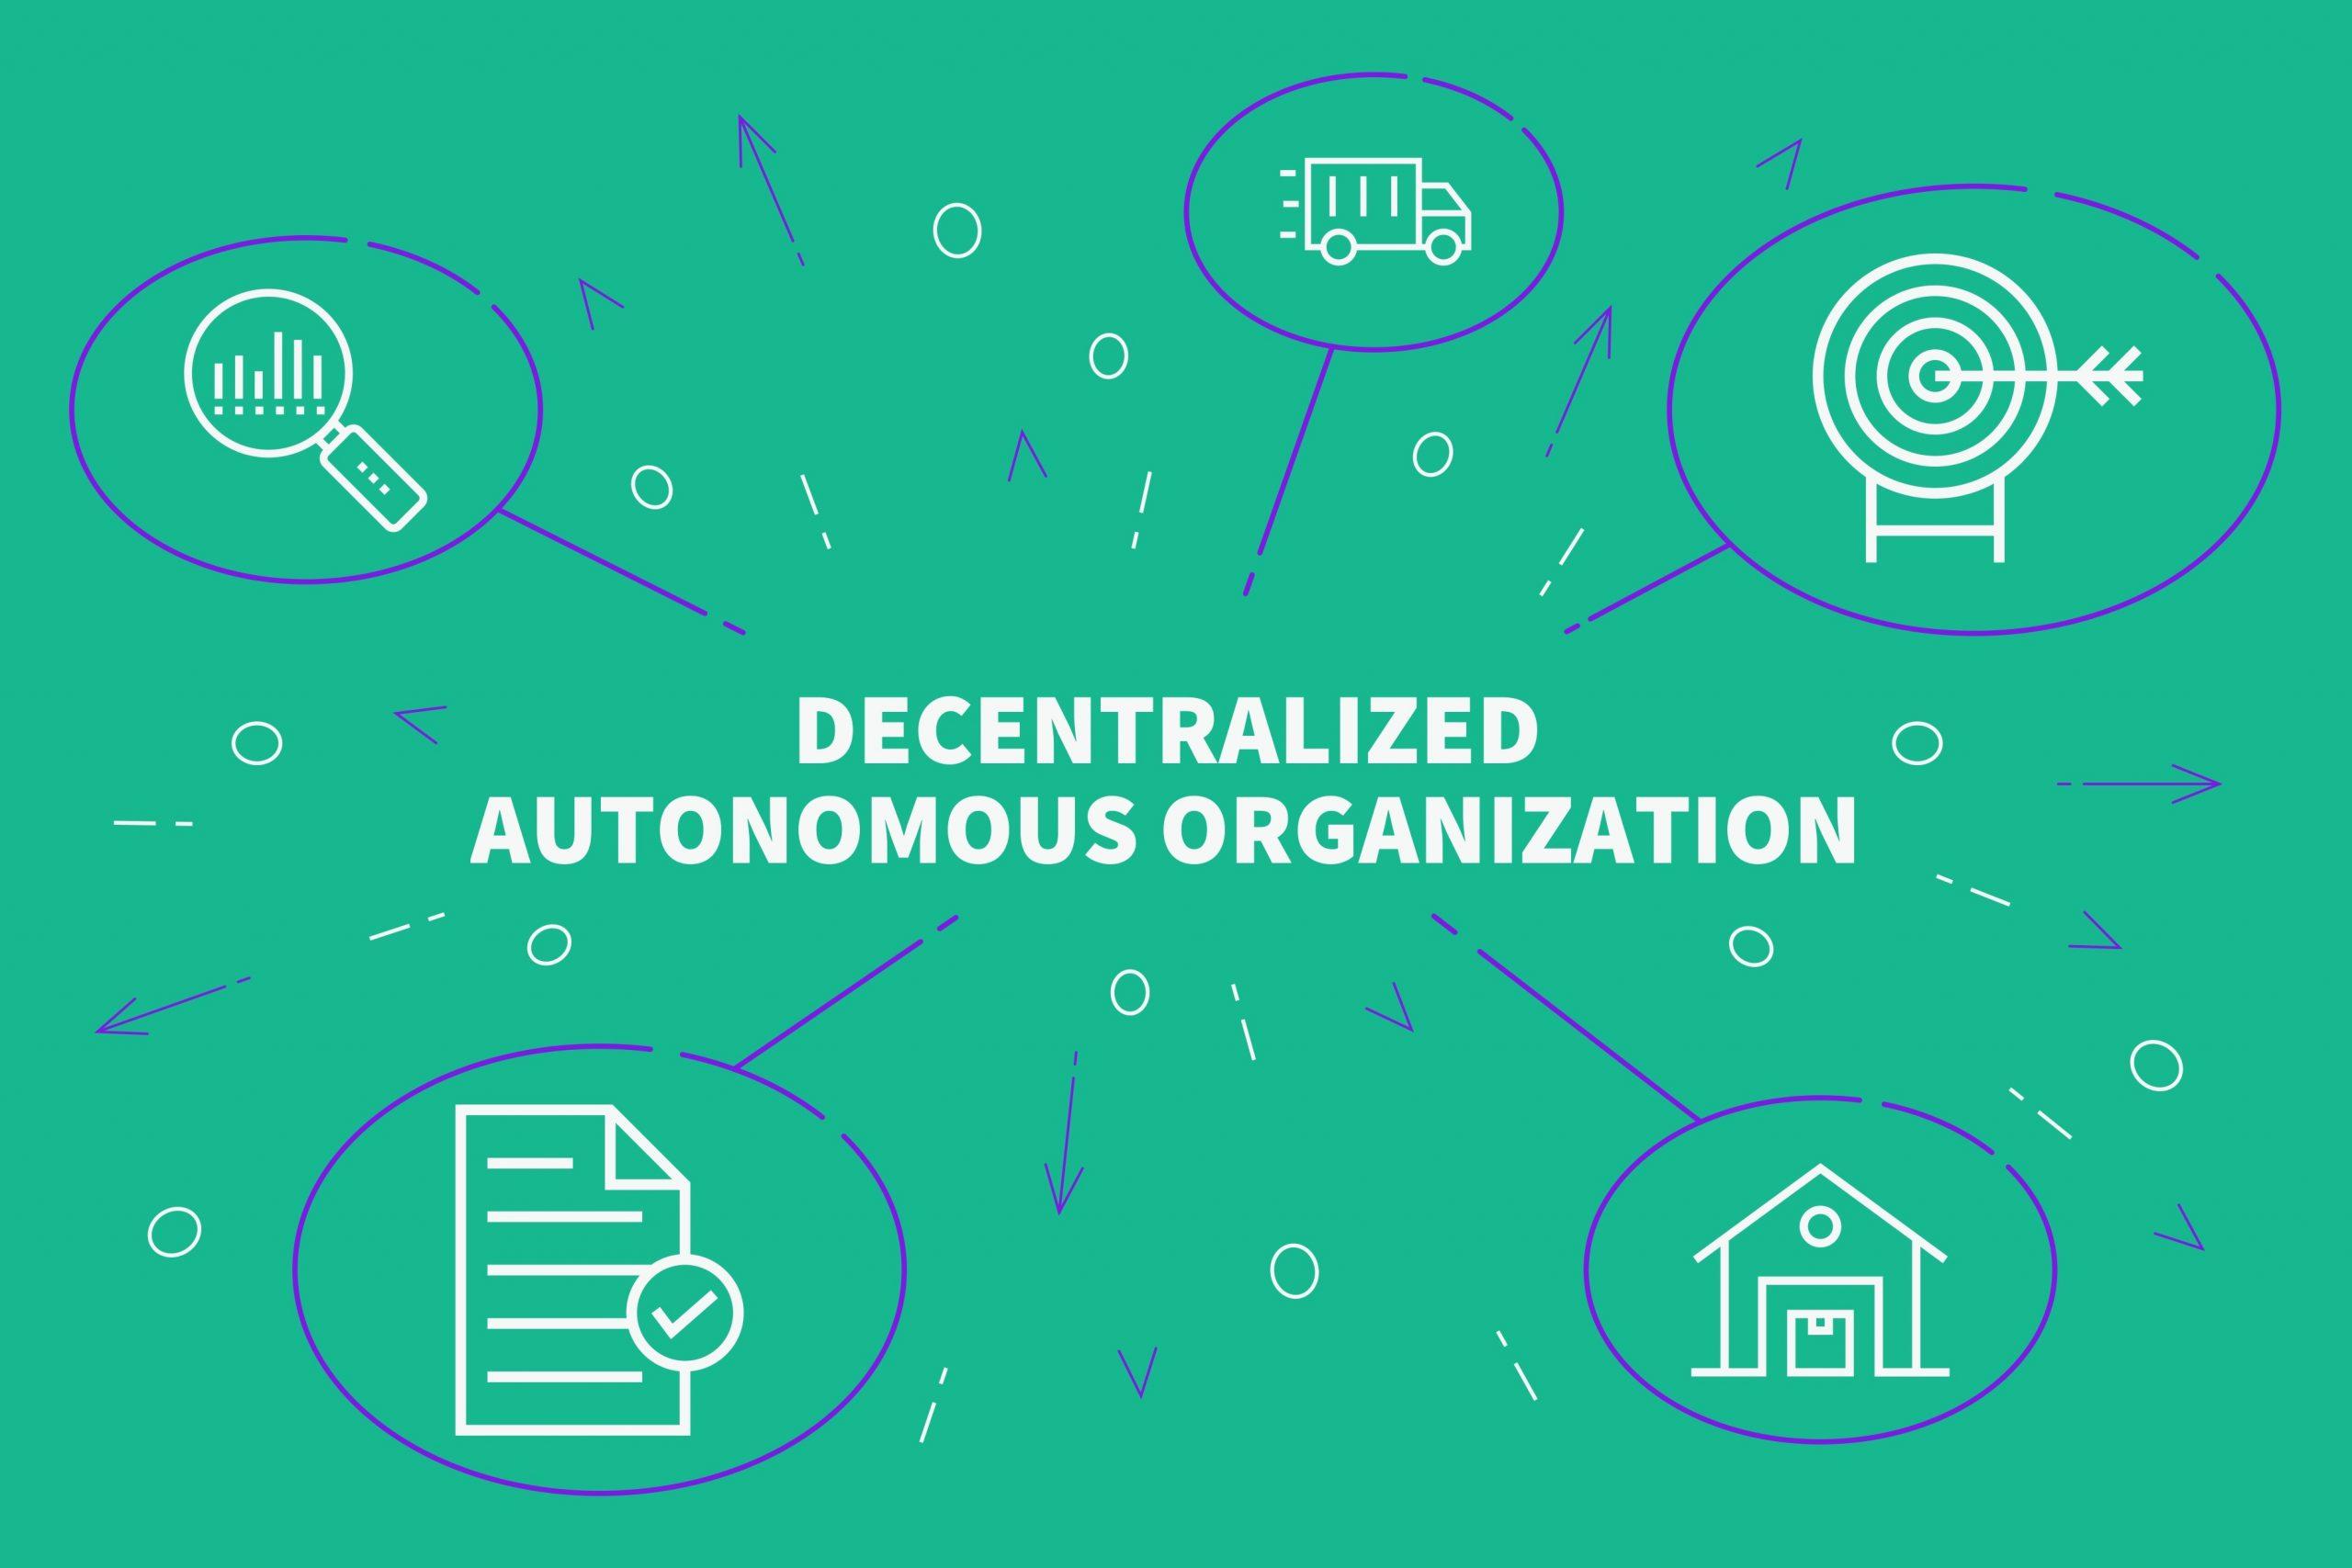 Decentralized Autonomous Organization - DAO